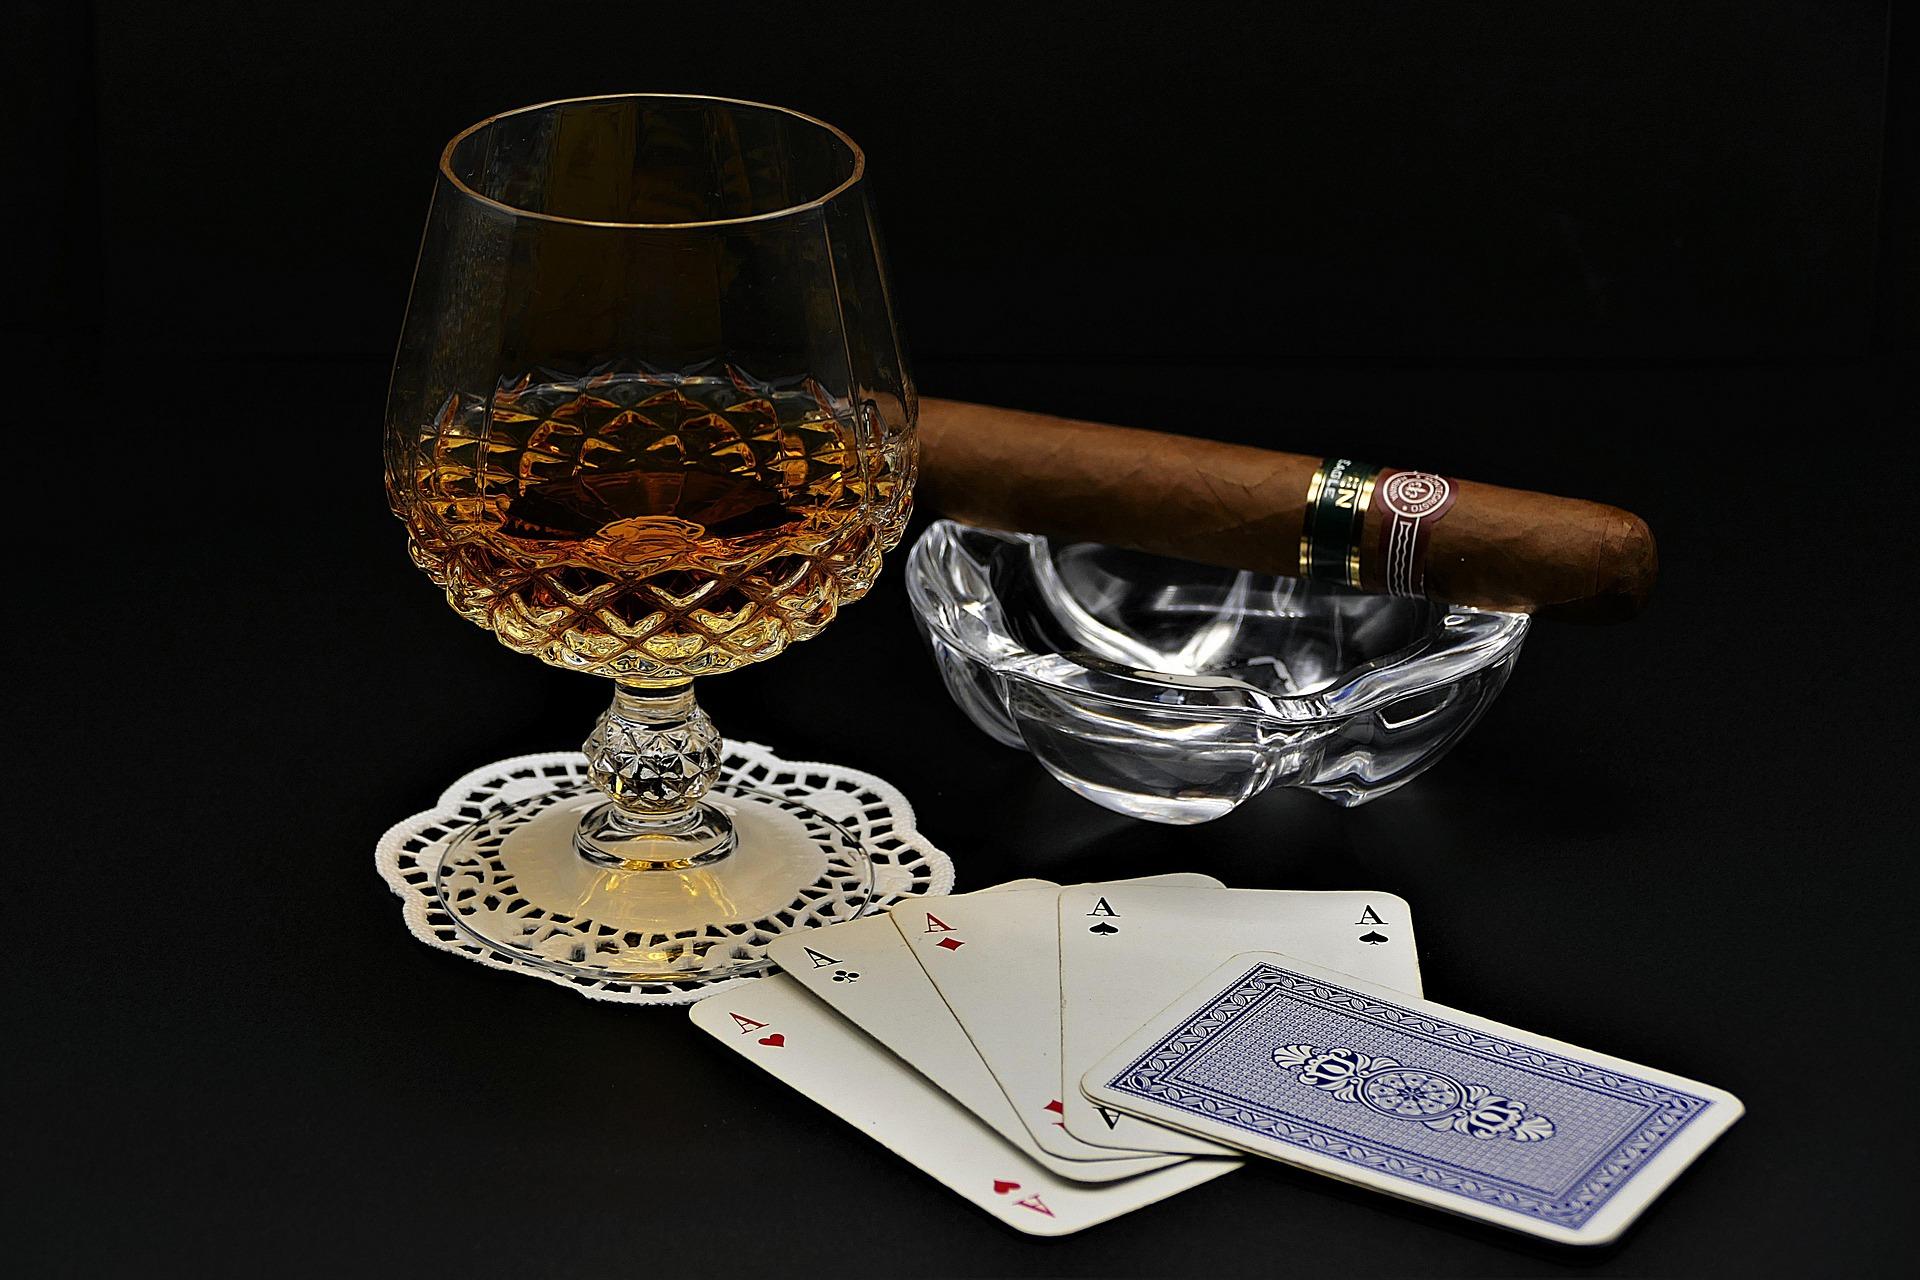 Gioco d'azzardo e alcool